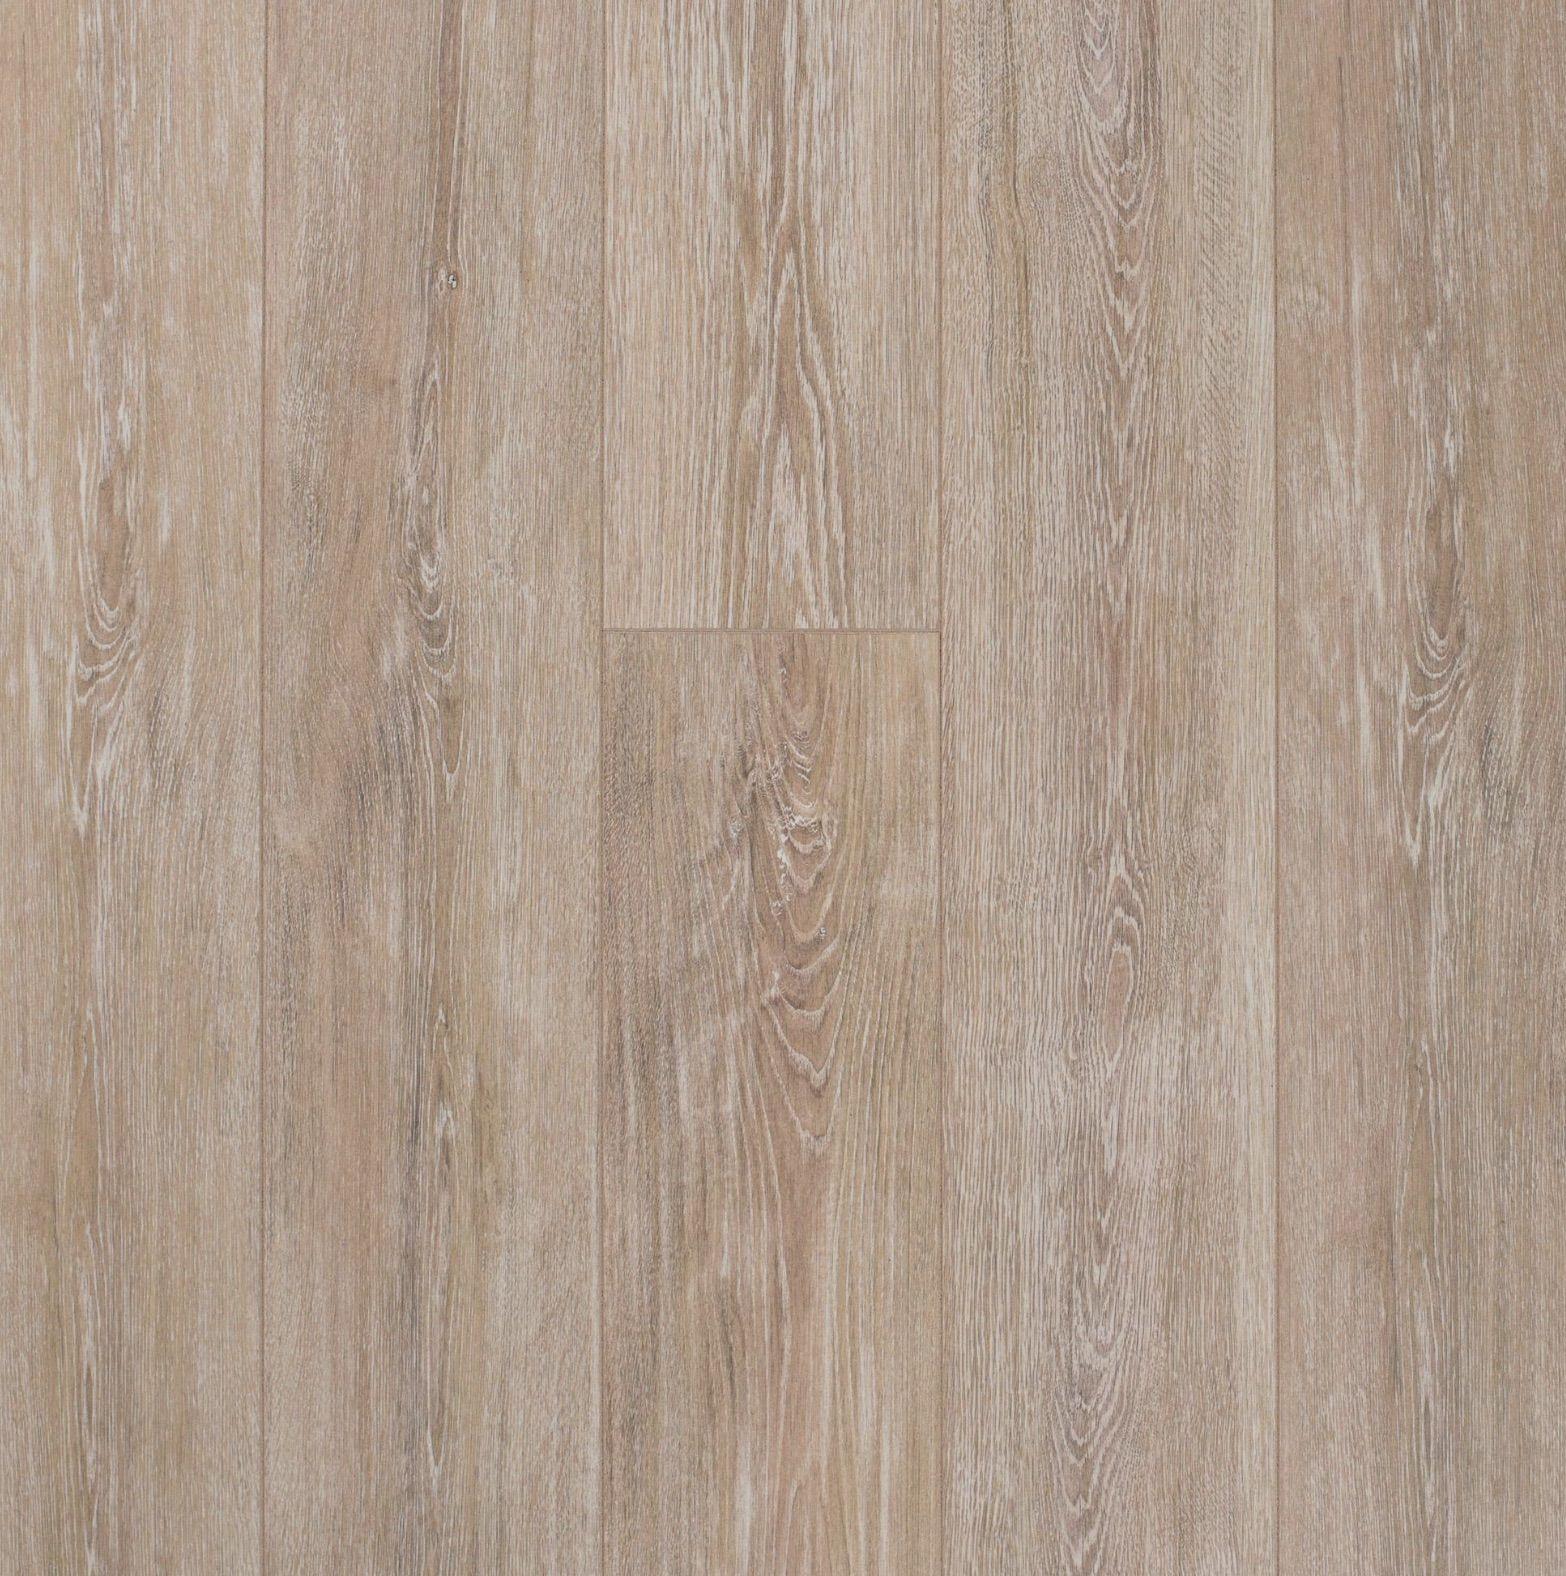 Sunset Oak Smooth Cork Plank Wood Floors Wide Plank Flooring